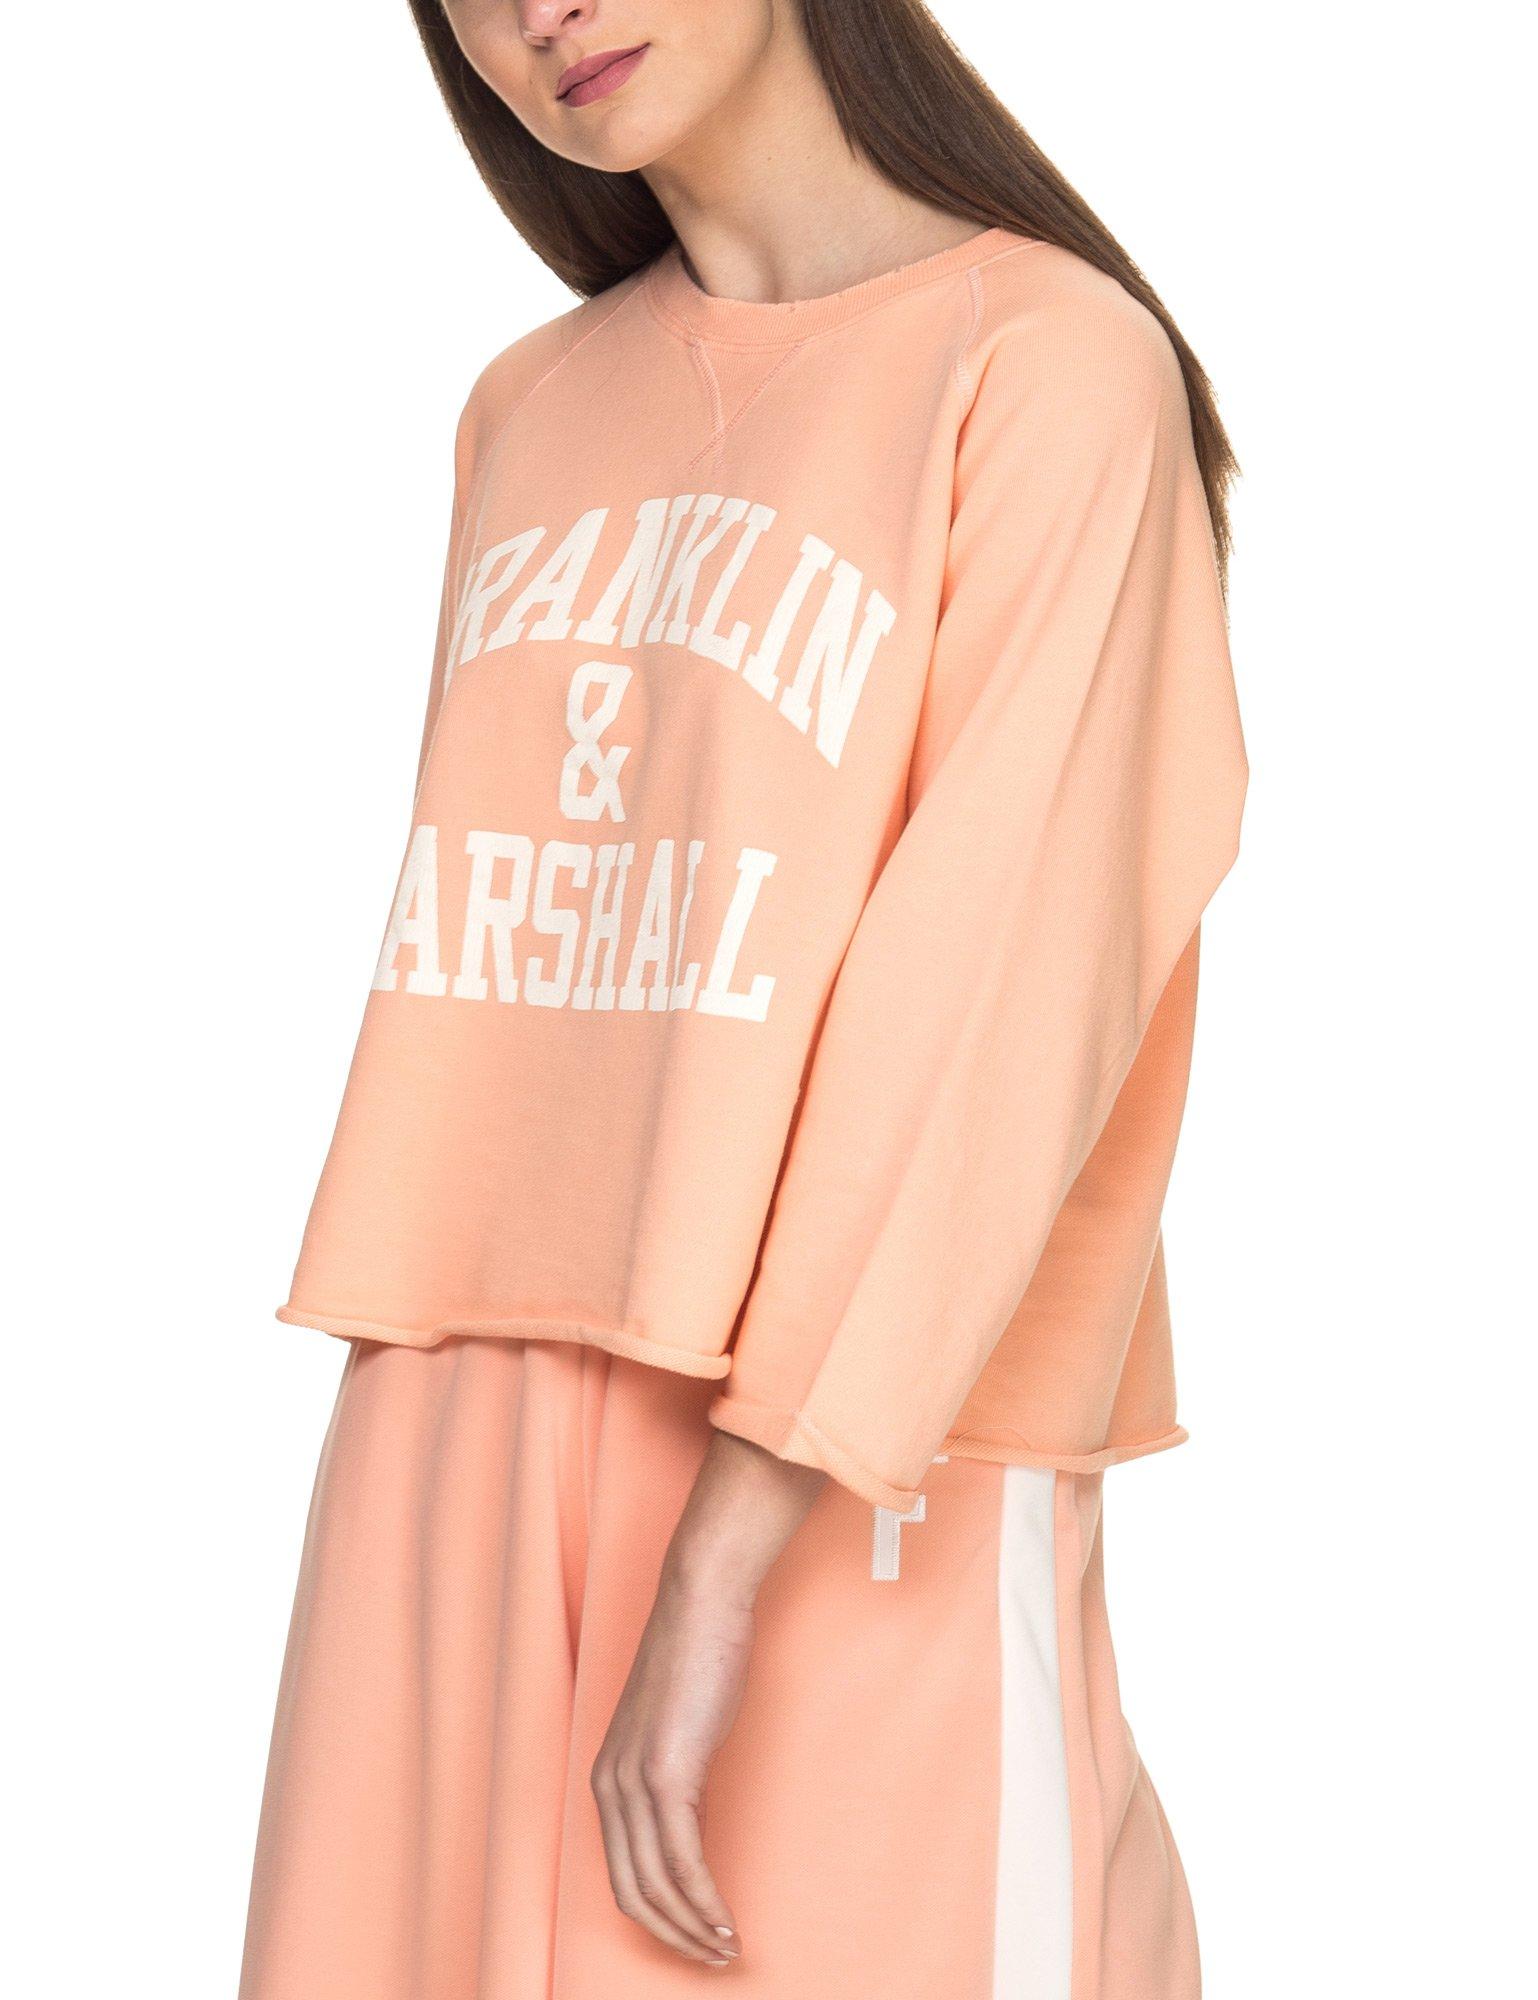 Franklin & Marshall Women's Women's Orange Sweatshirt In Size S Orange